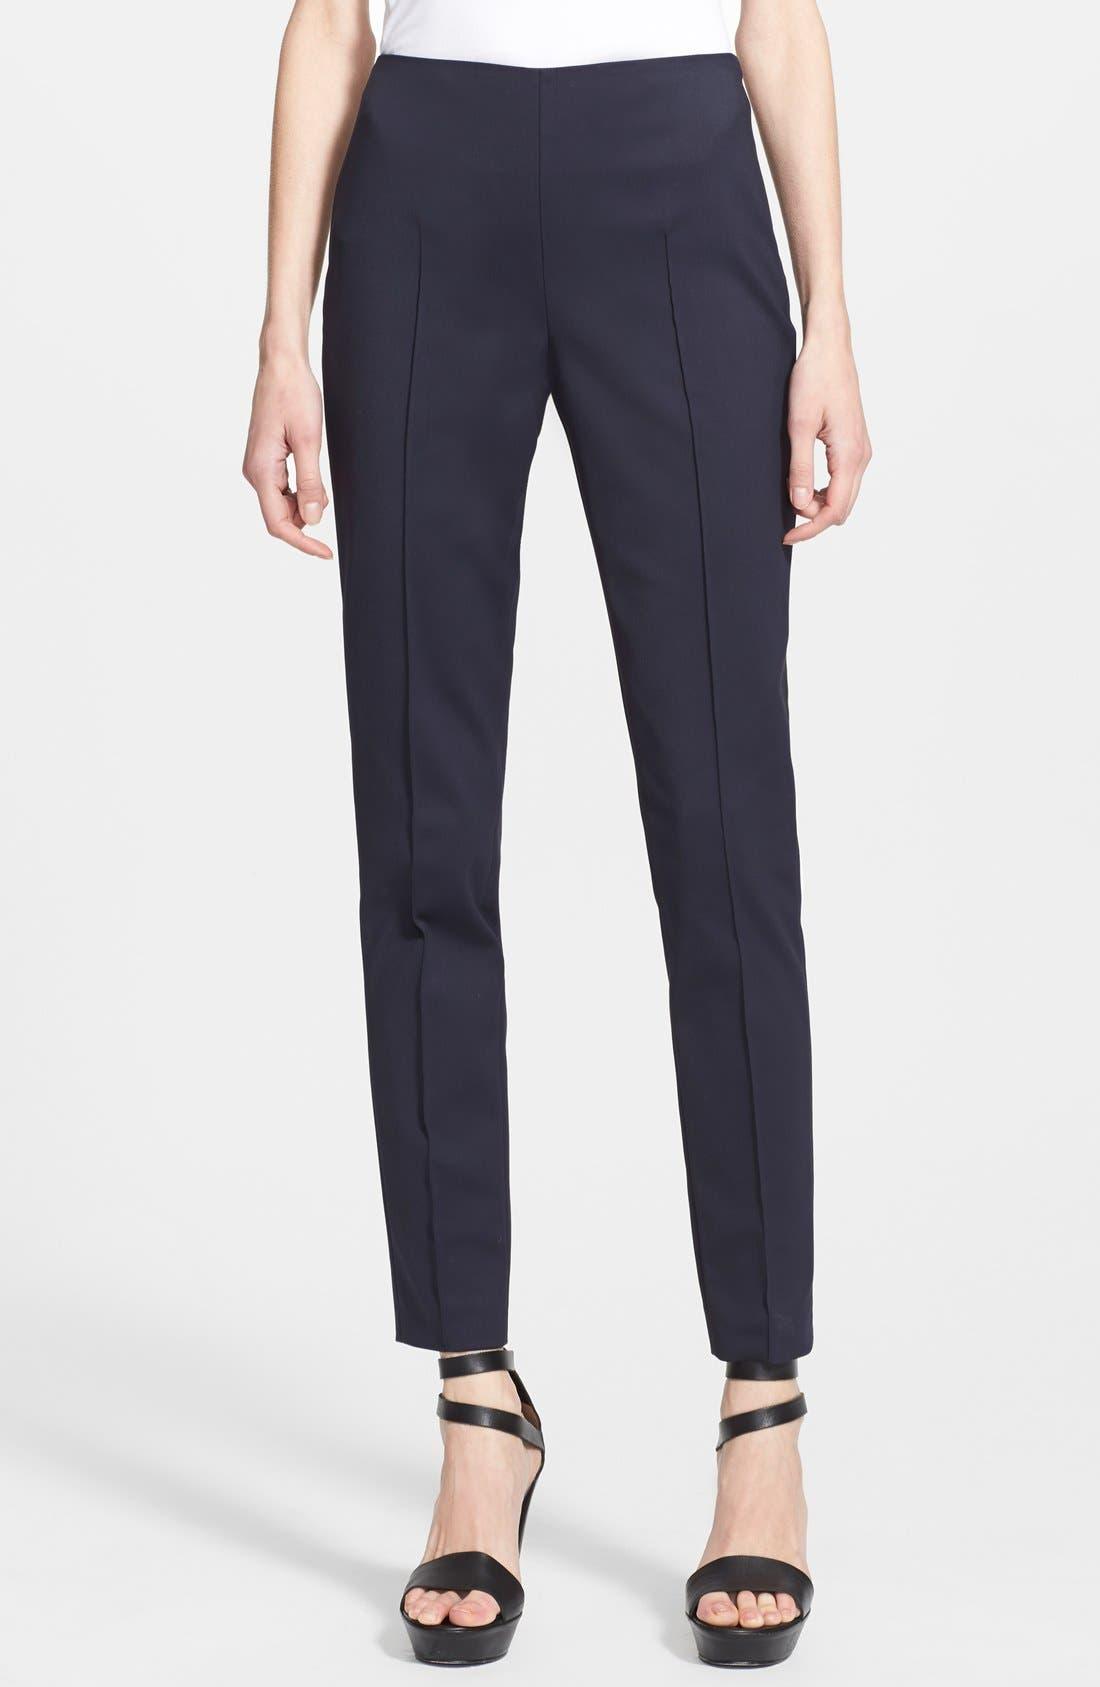 AKRIS 'Melissa' Slim Techno Cotton Ankle Pants